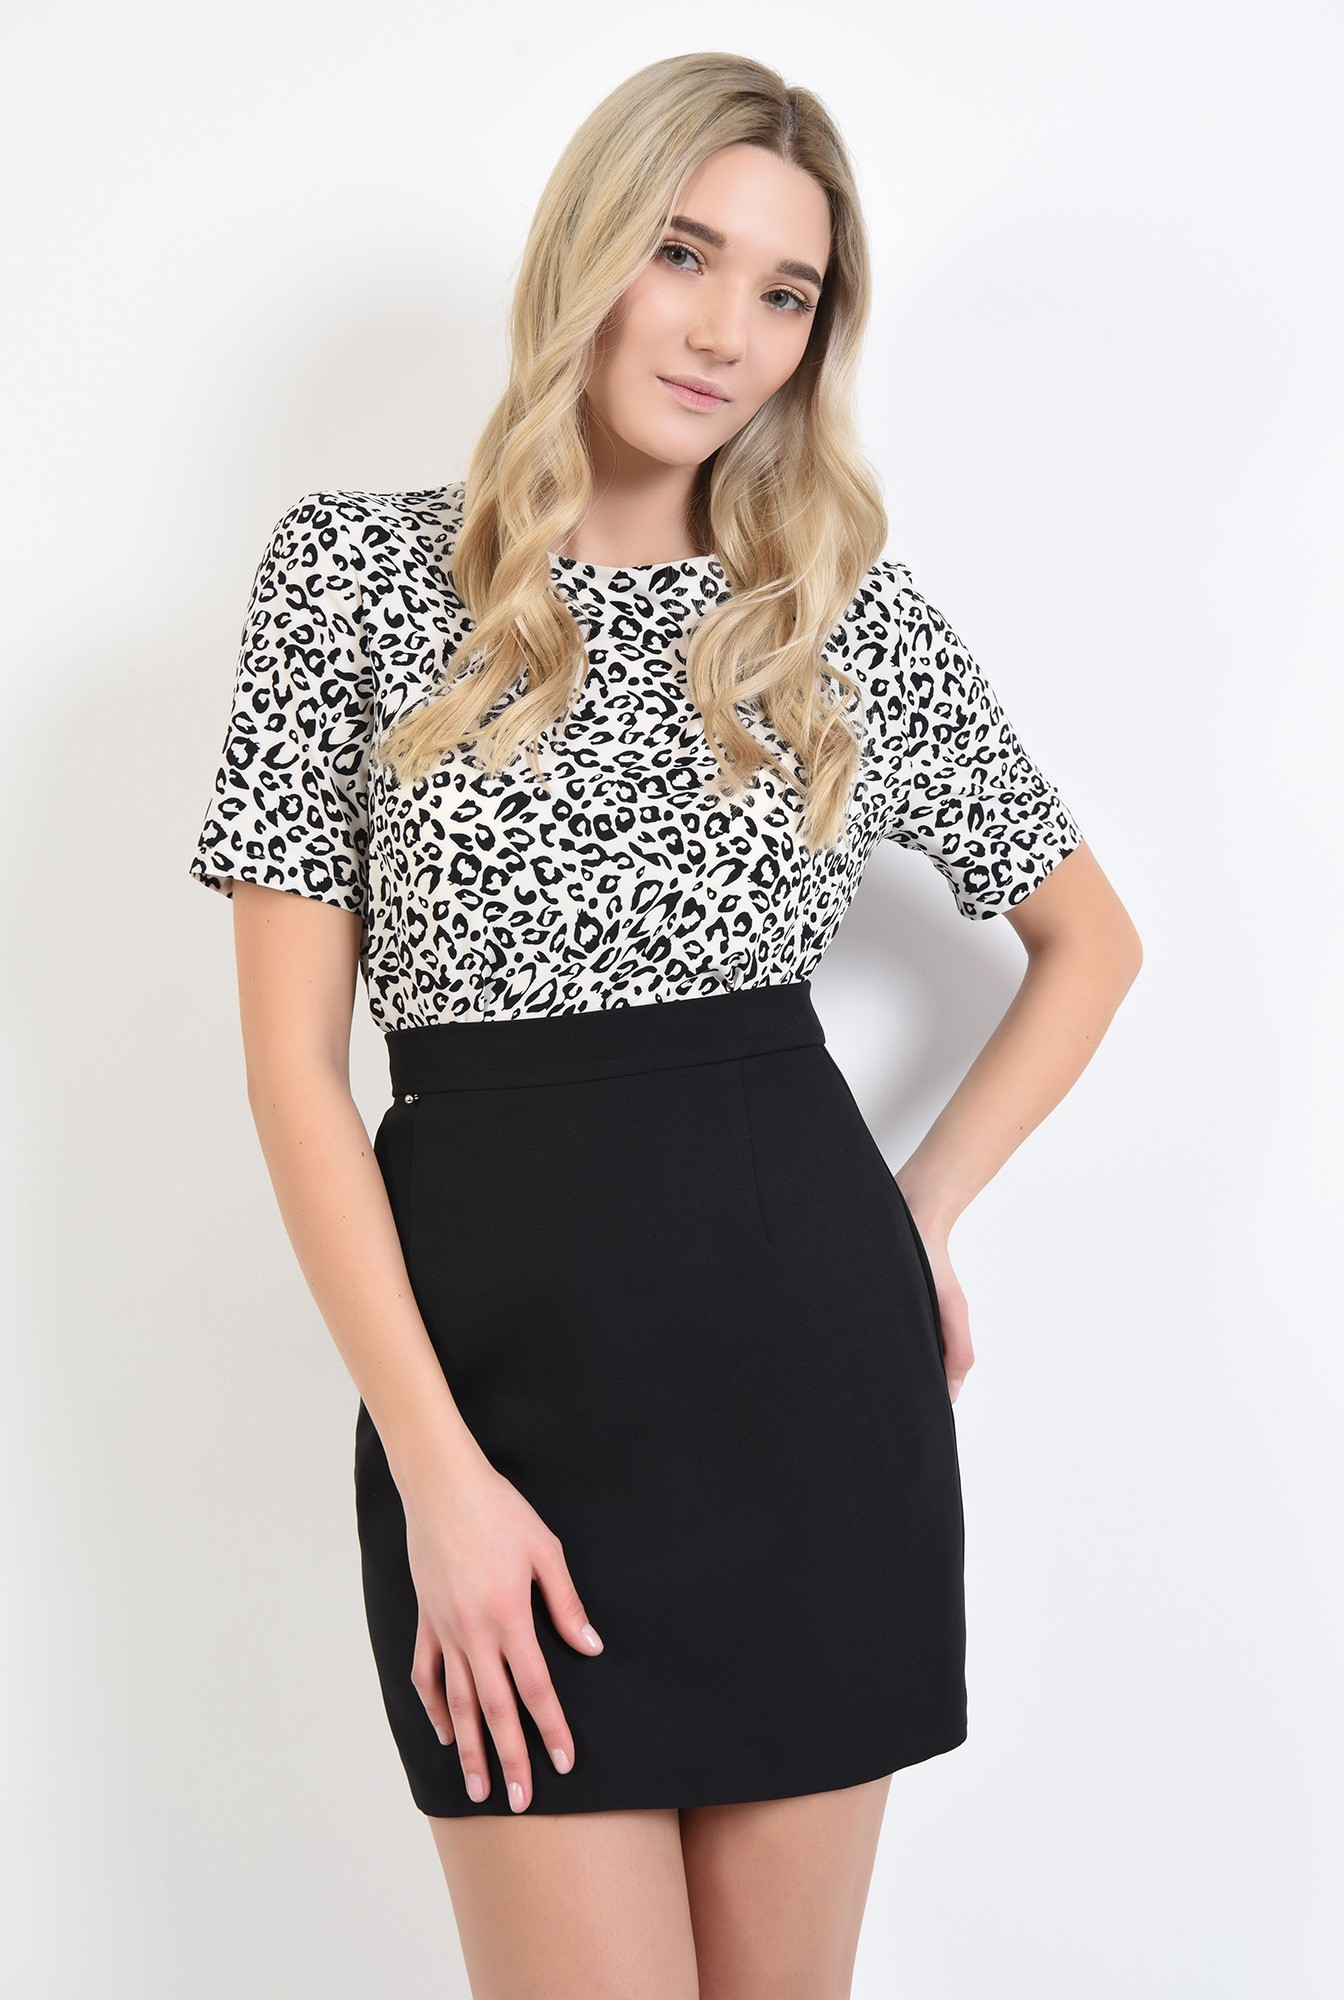 2 - bluze online, bluza de zi, imprimeu leopard, alb-negru, decolteu rotund la baza gatului